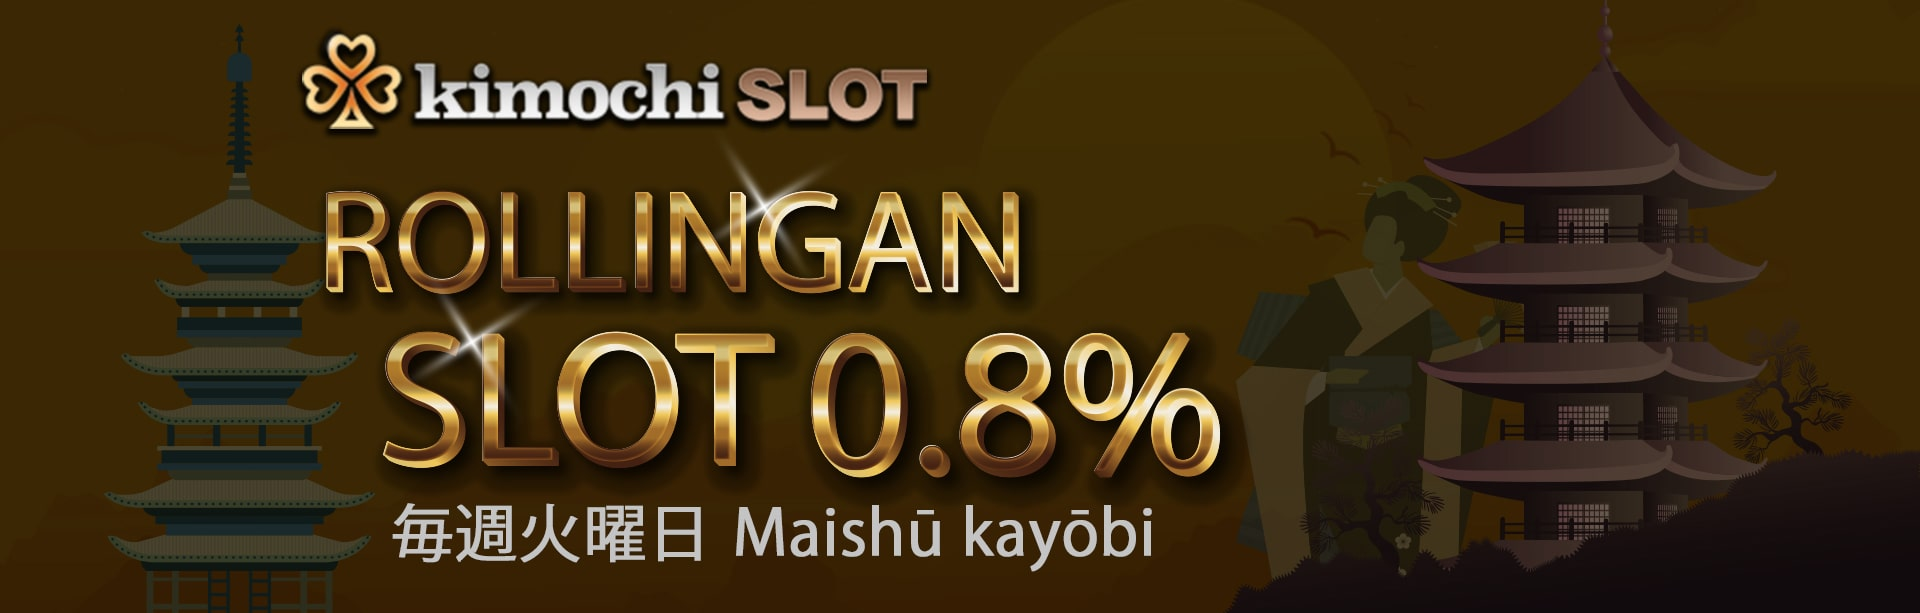 Rollingan slot 0,8% di KIMOCHISLOT